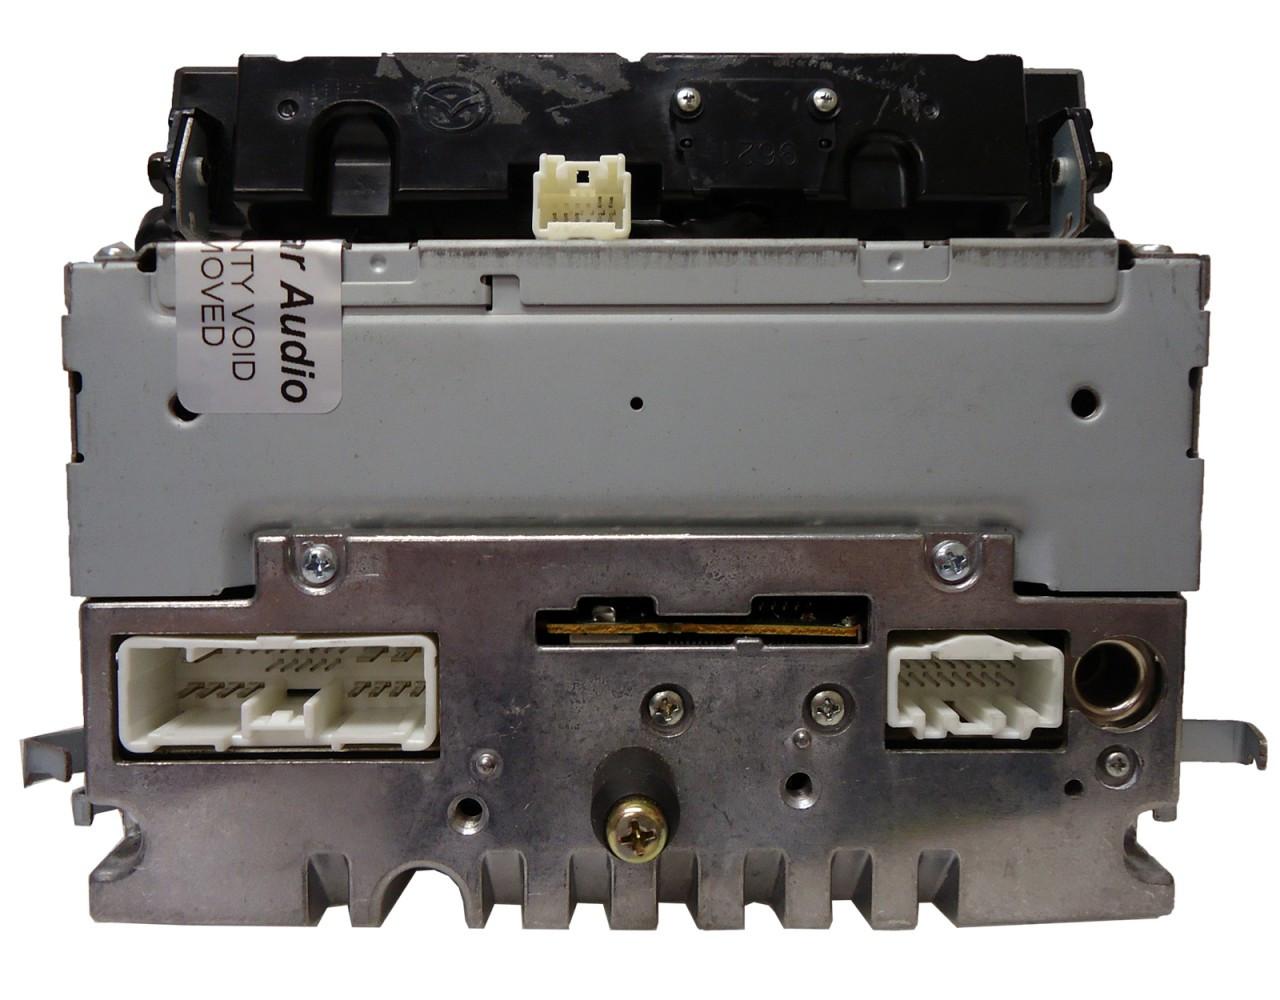 2006 2007 Mazda 3 Satellite Radio Stereo Tape Player Cd Player